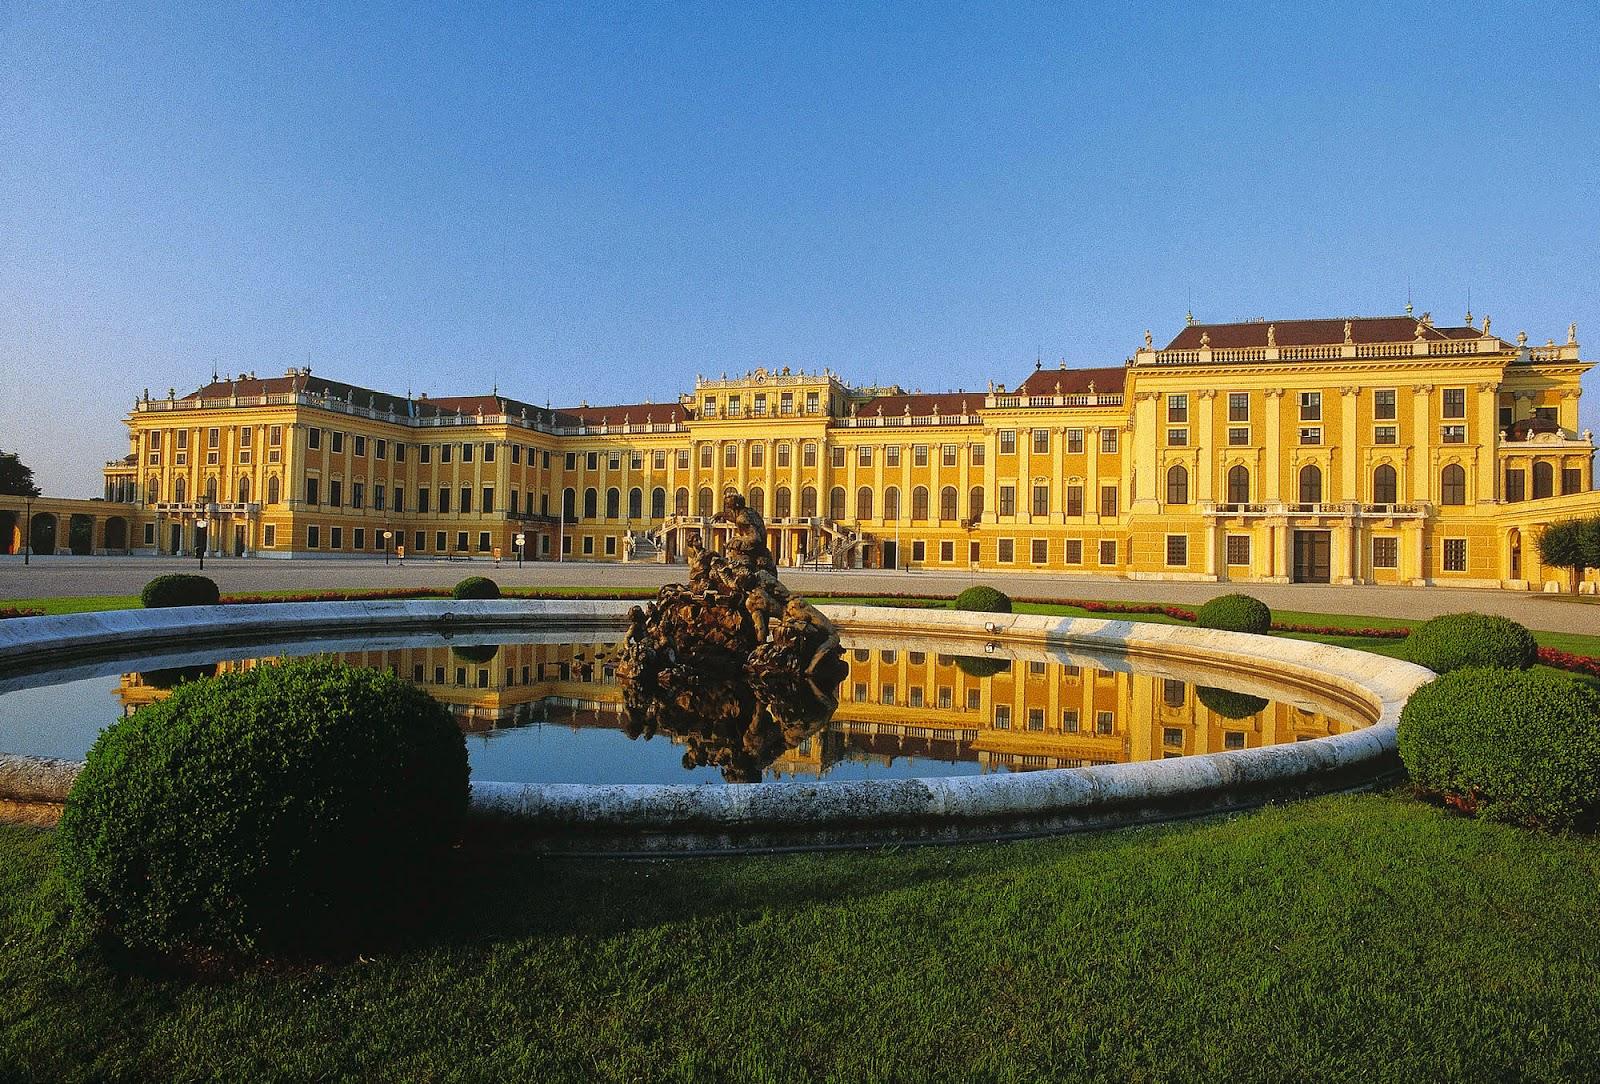 [Resim: schonbrunn-palace-fountain-vienna.jpg]